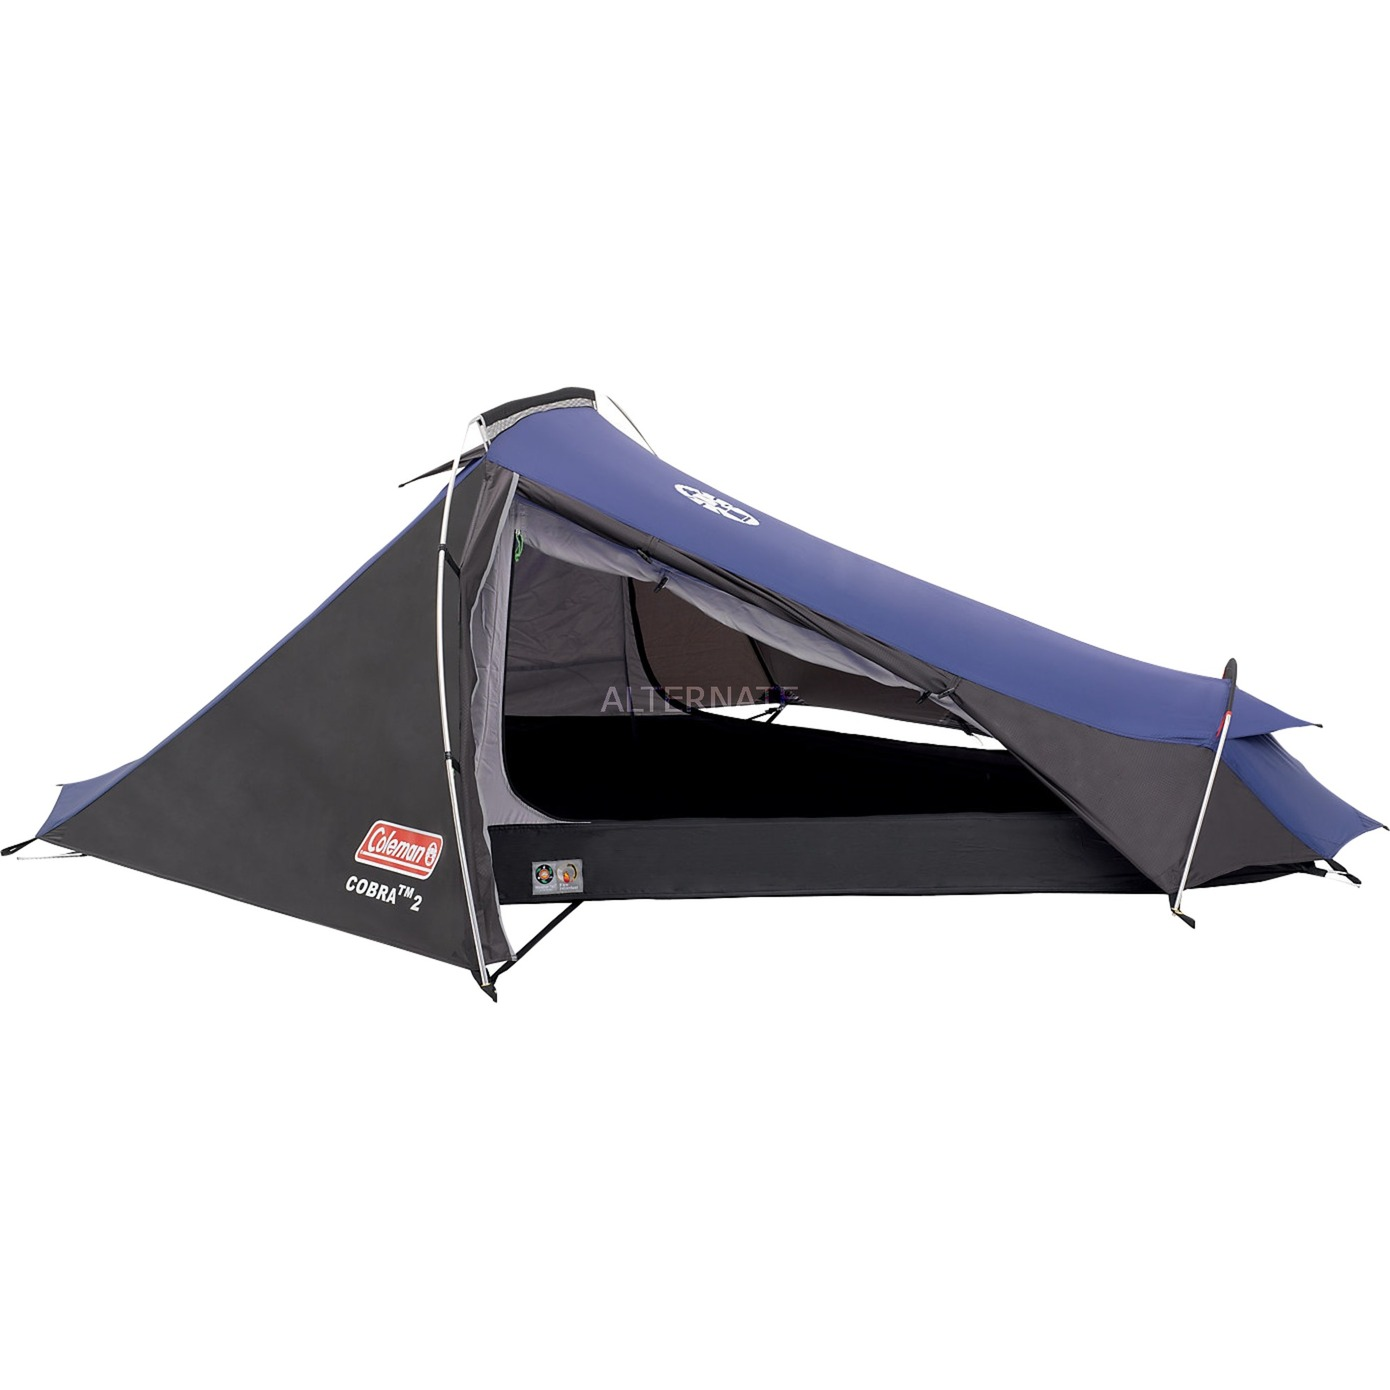 cobra-2-2-messing-telt